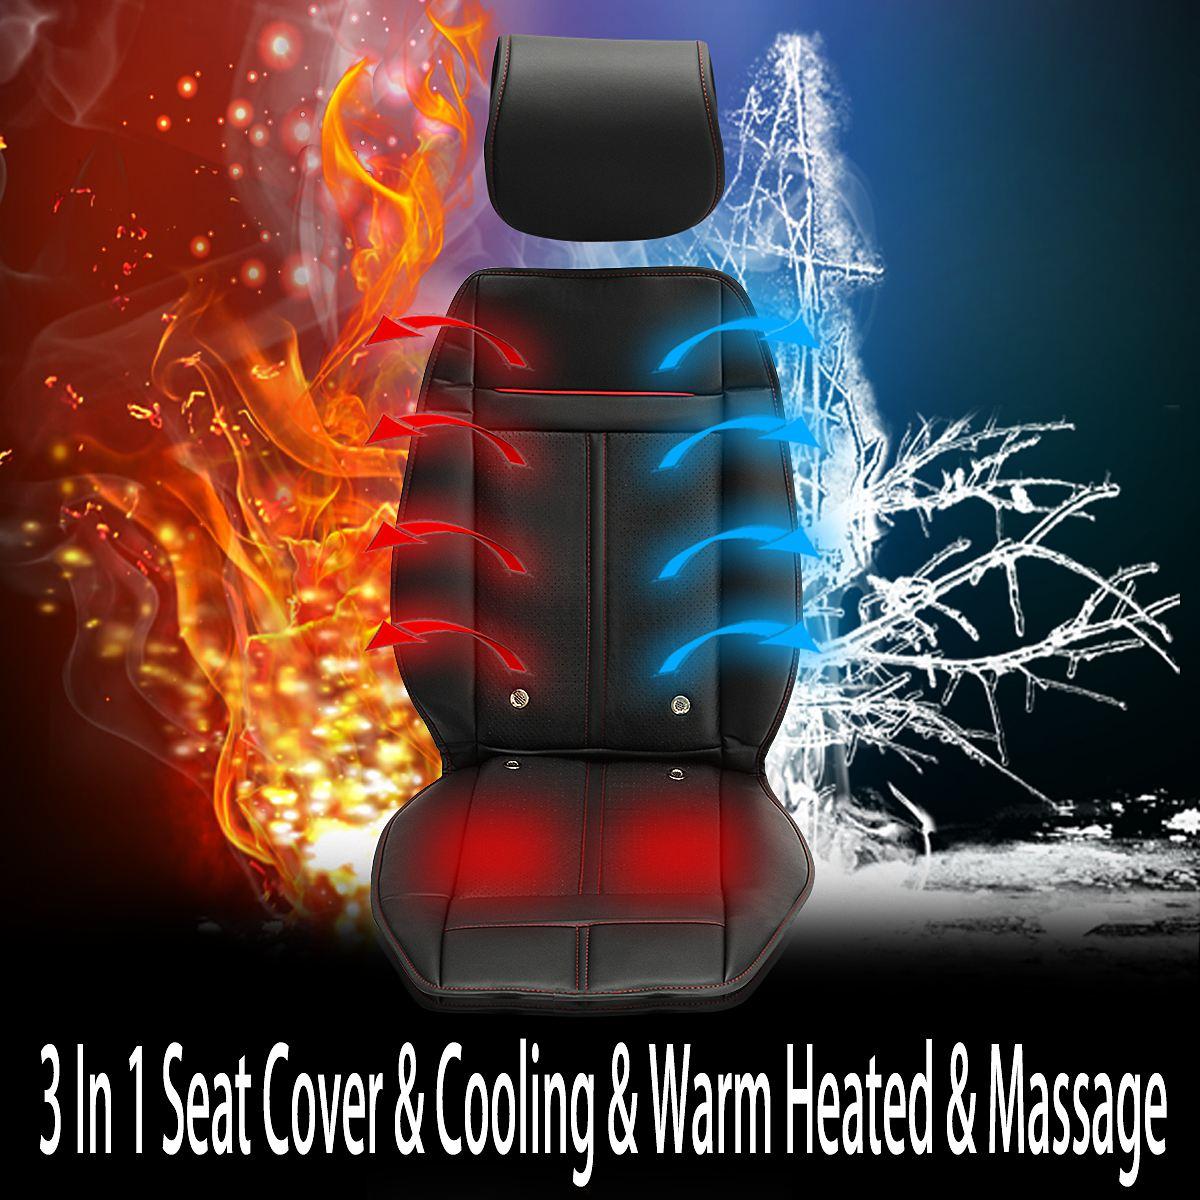 Фотография 3 In 1 Auto Car Heated Seat Covers Pad Electric Cushion Ventilation w/ Cooling Warm Heated & Massage